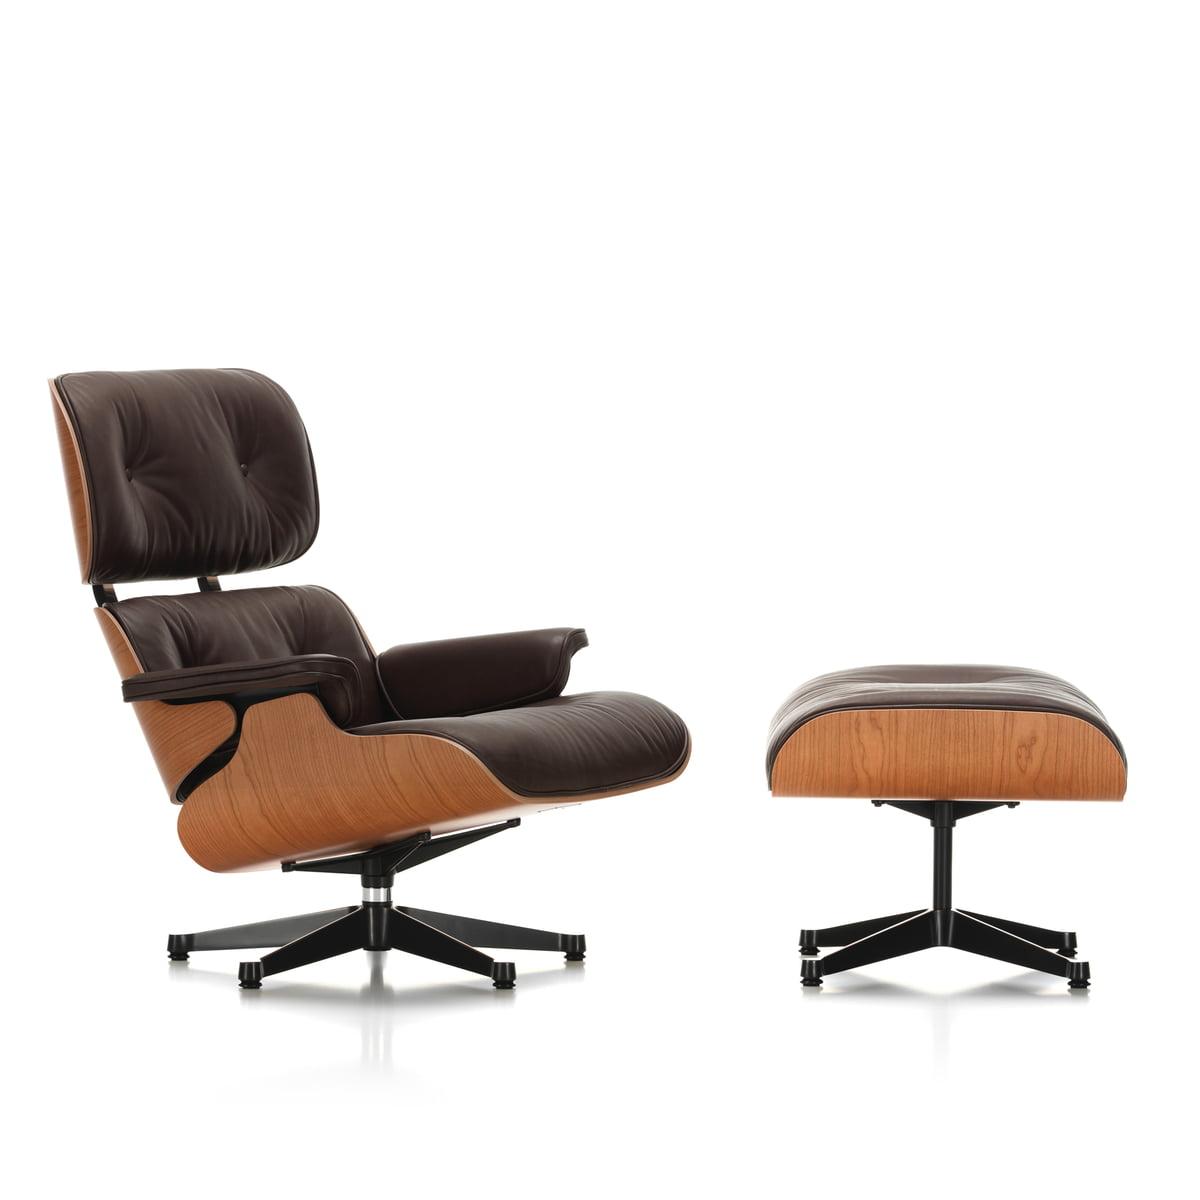 Vitra lounge chair ottoman kirschbaum for Vitra lounge chair